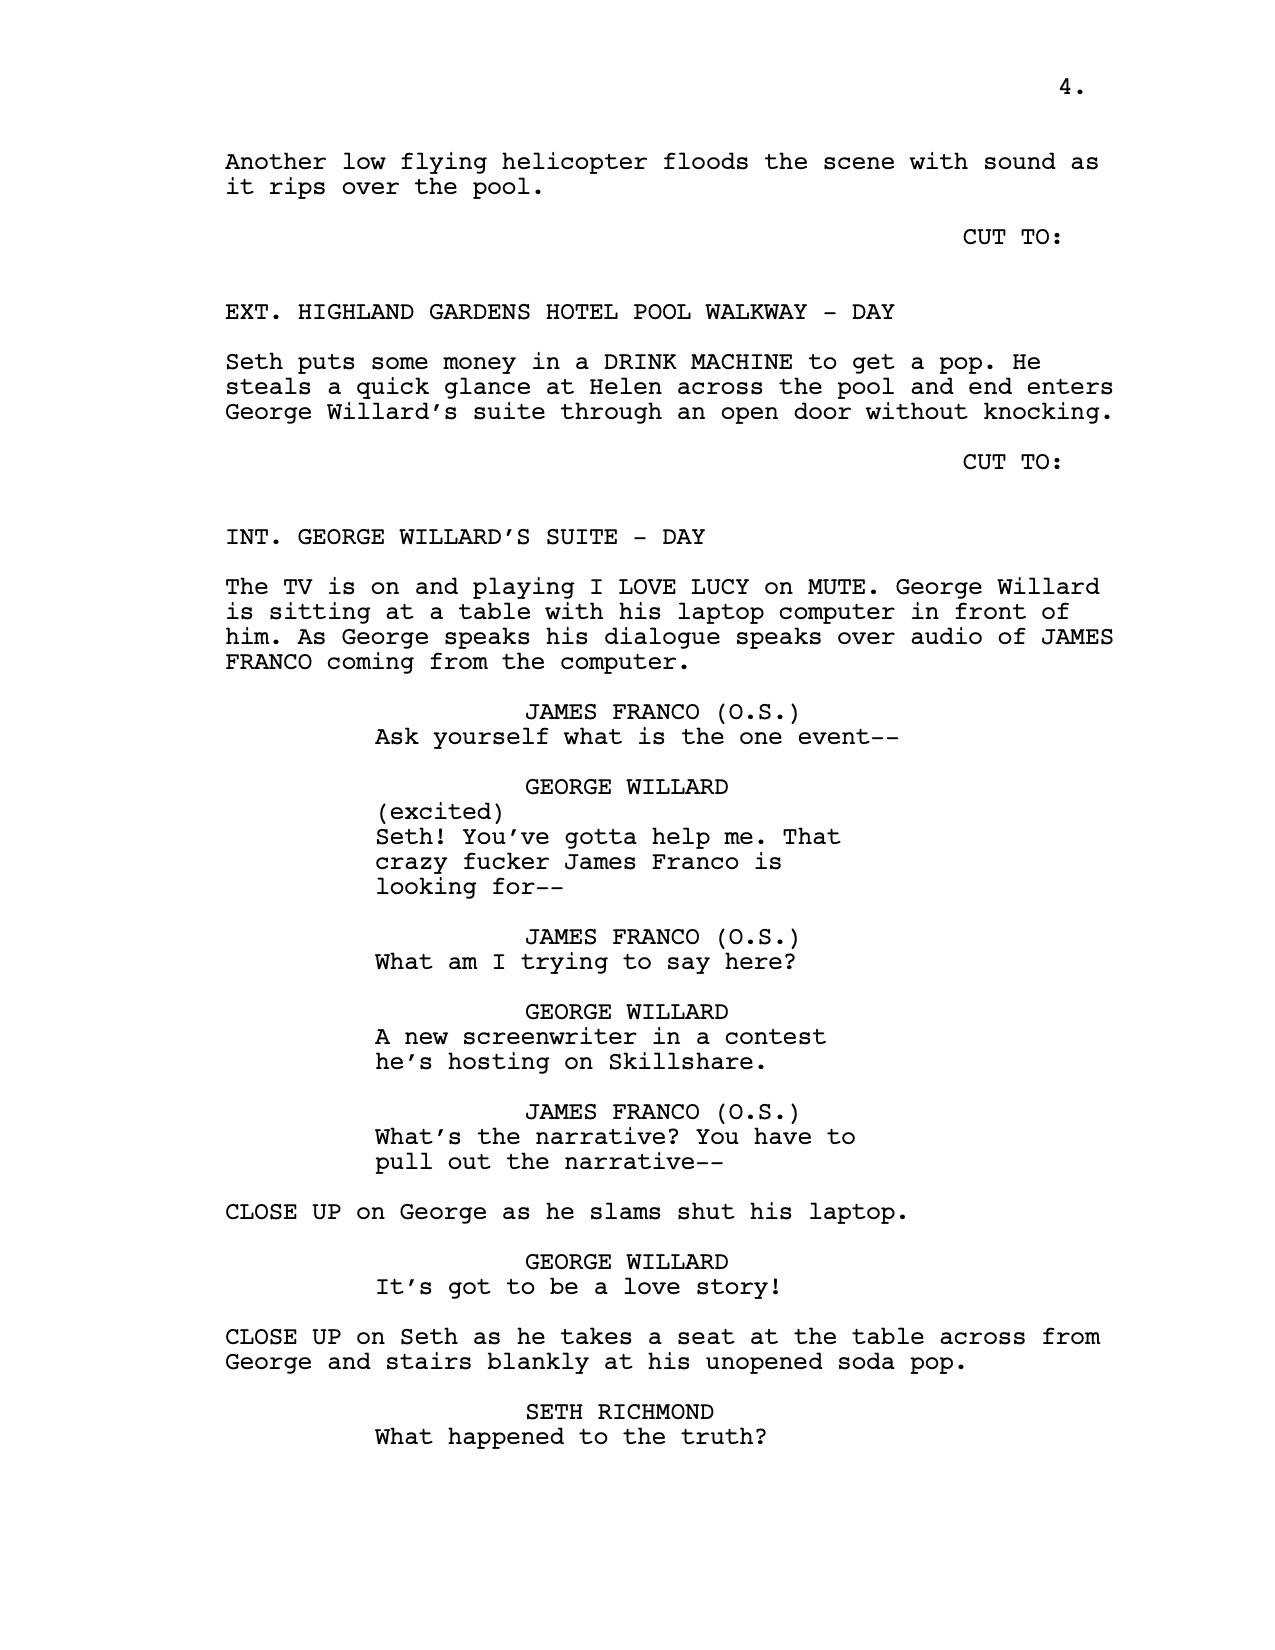 Page-4-DavidLook-TheGardens-1